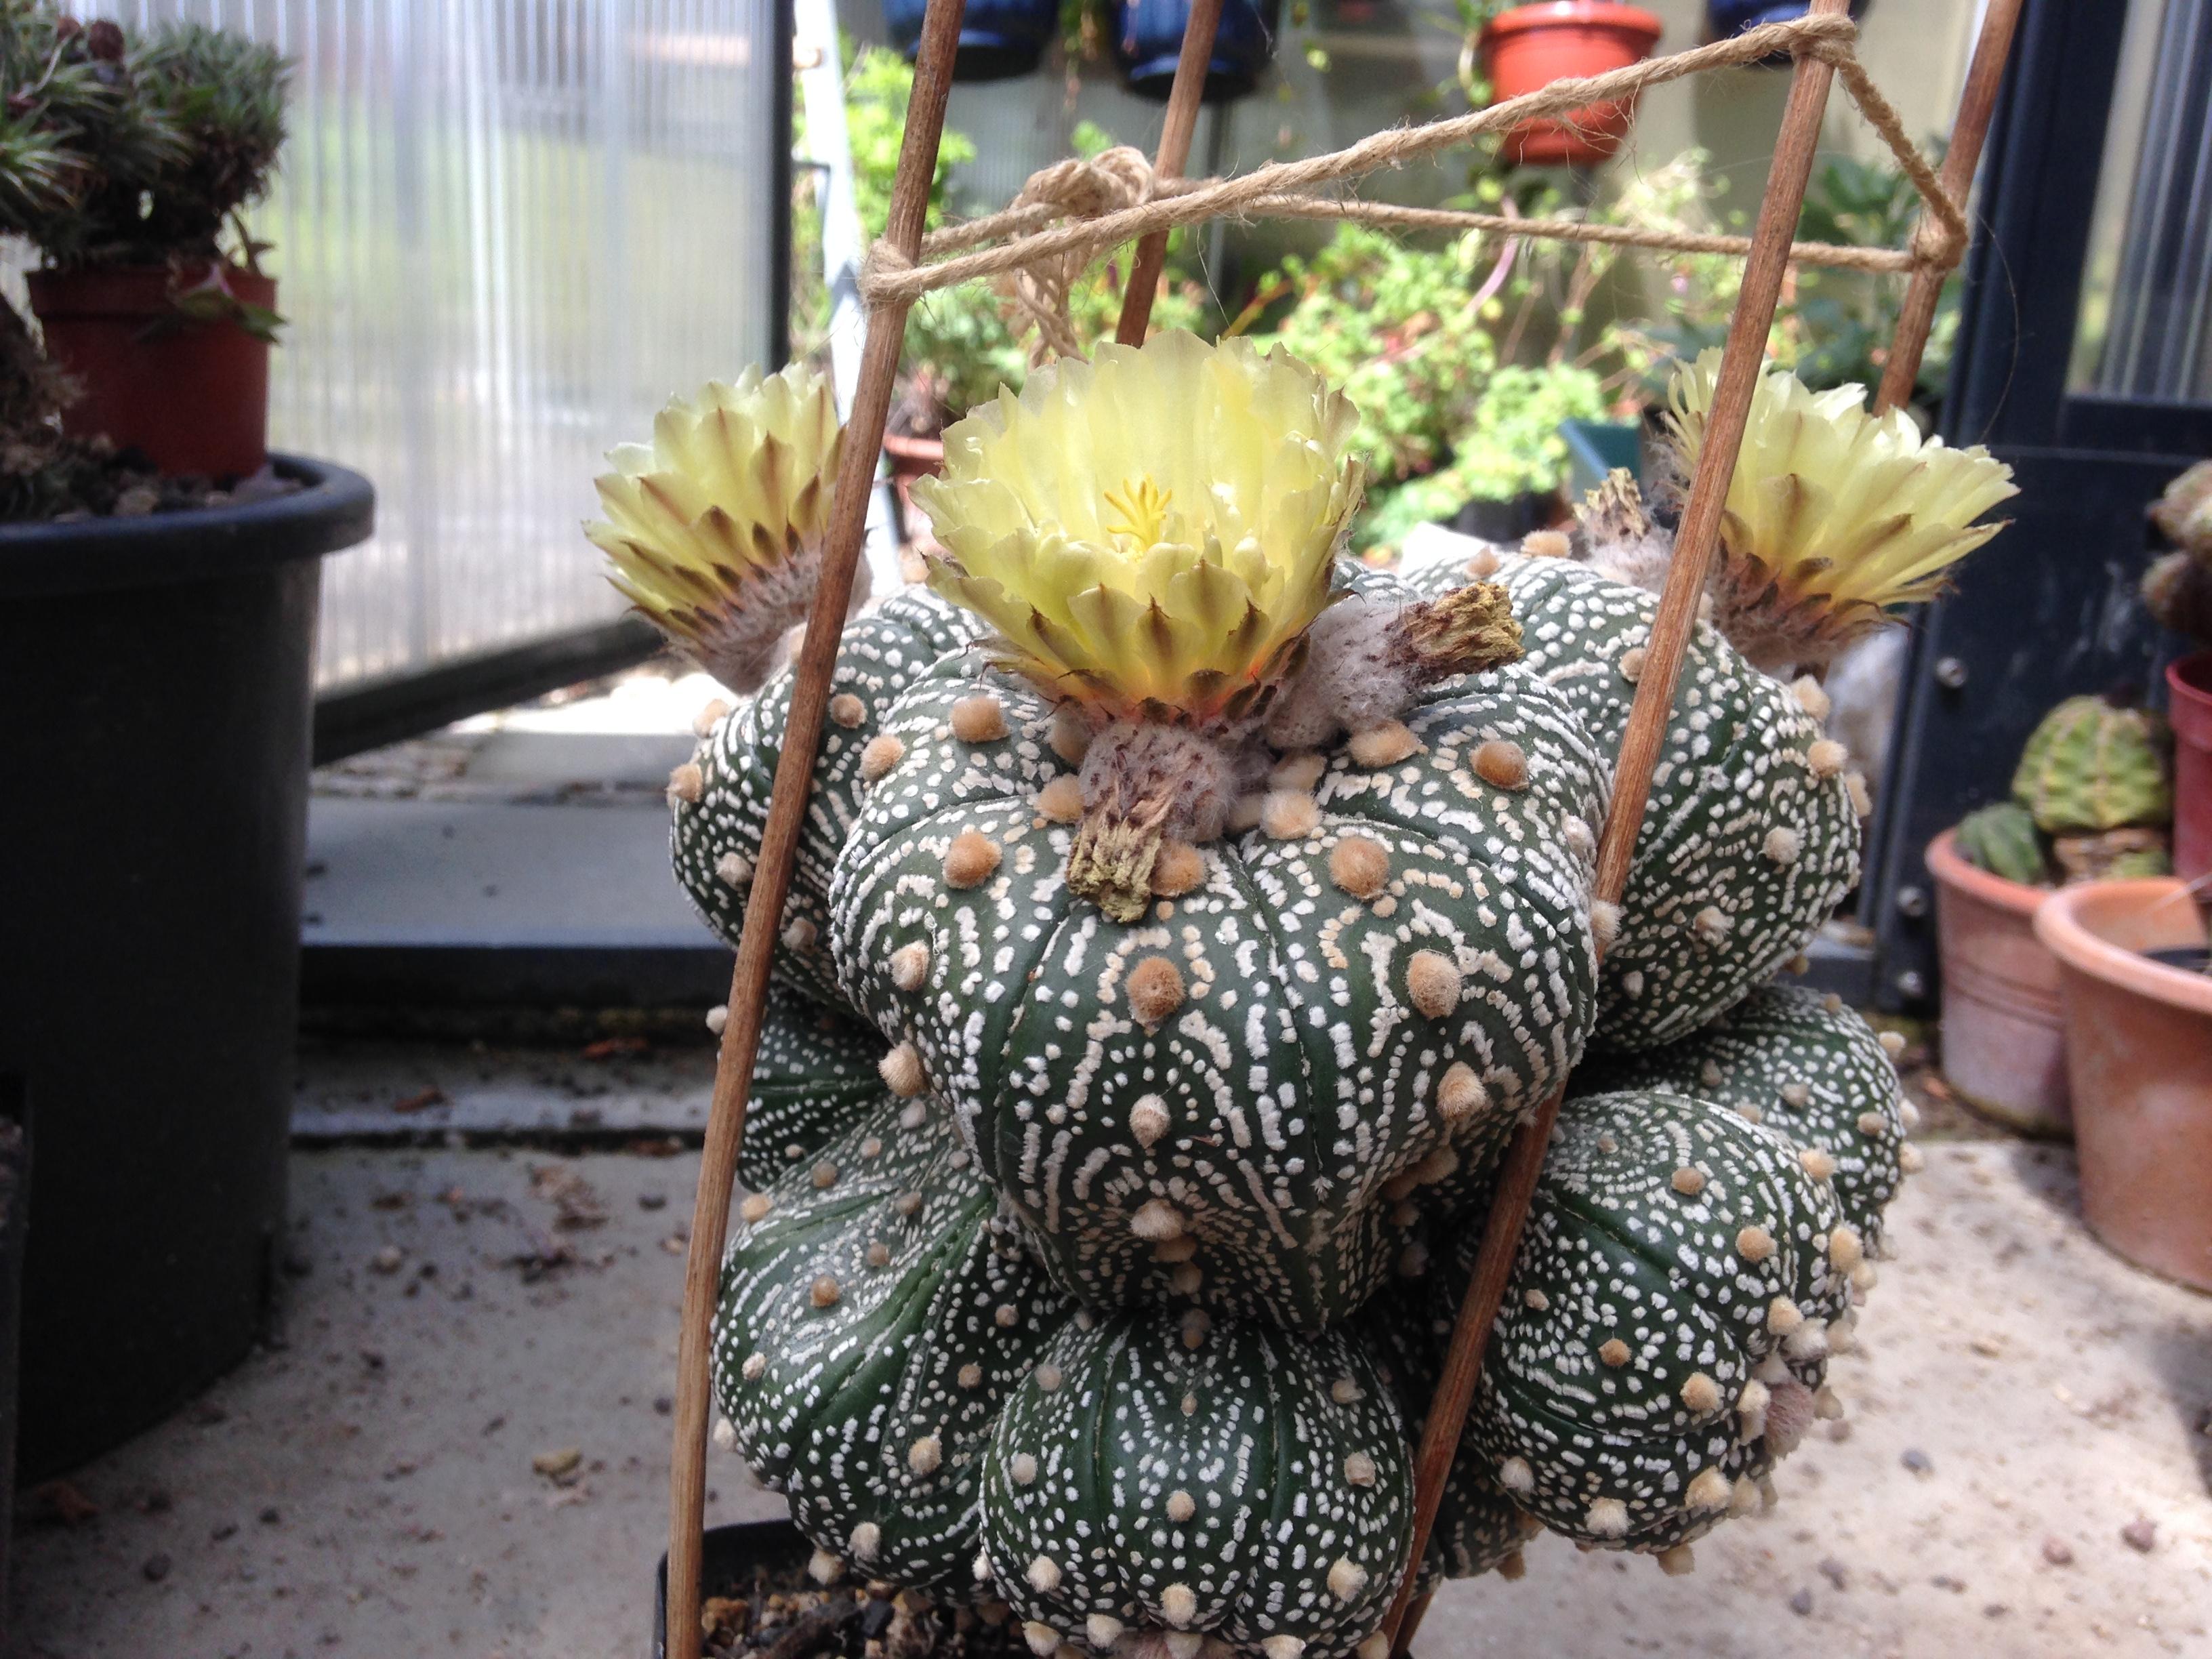 Astrophytum asterias cv. Hanazoe (jap. Culturhybride)